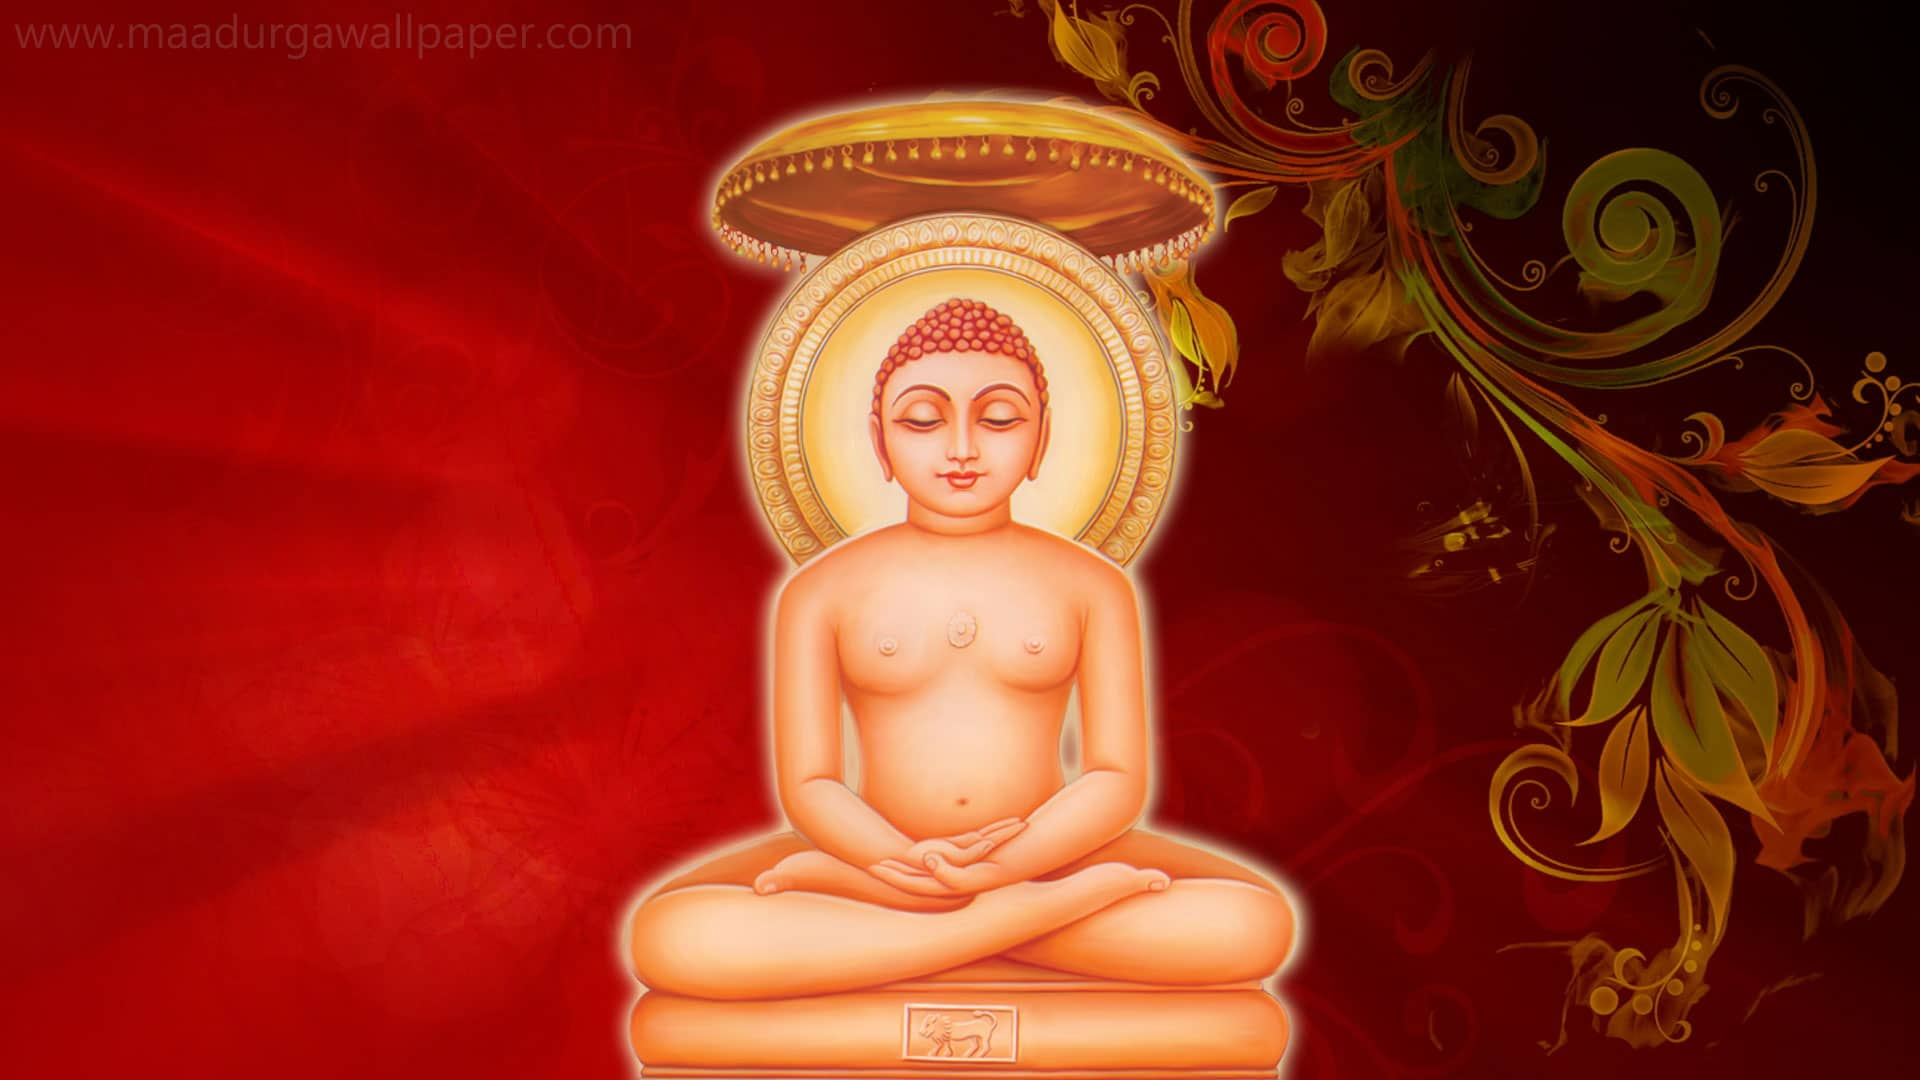 Diwali in Jainism: Why Jains celebrate Diwali? Diwali Significance for Jains